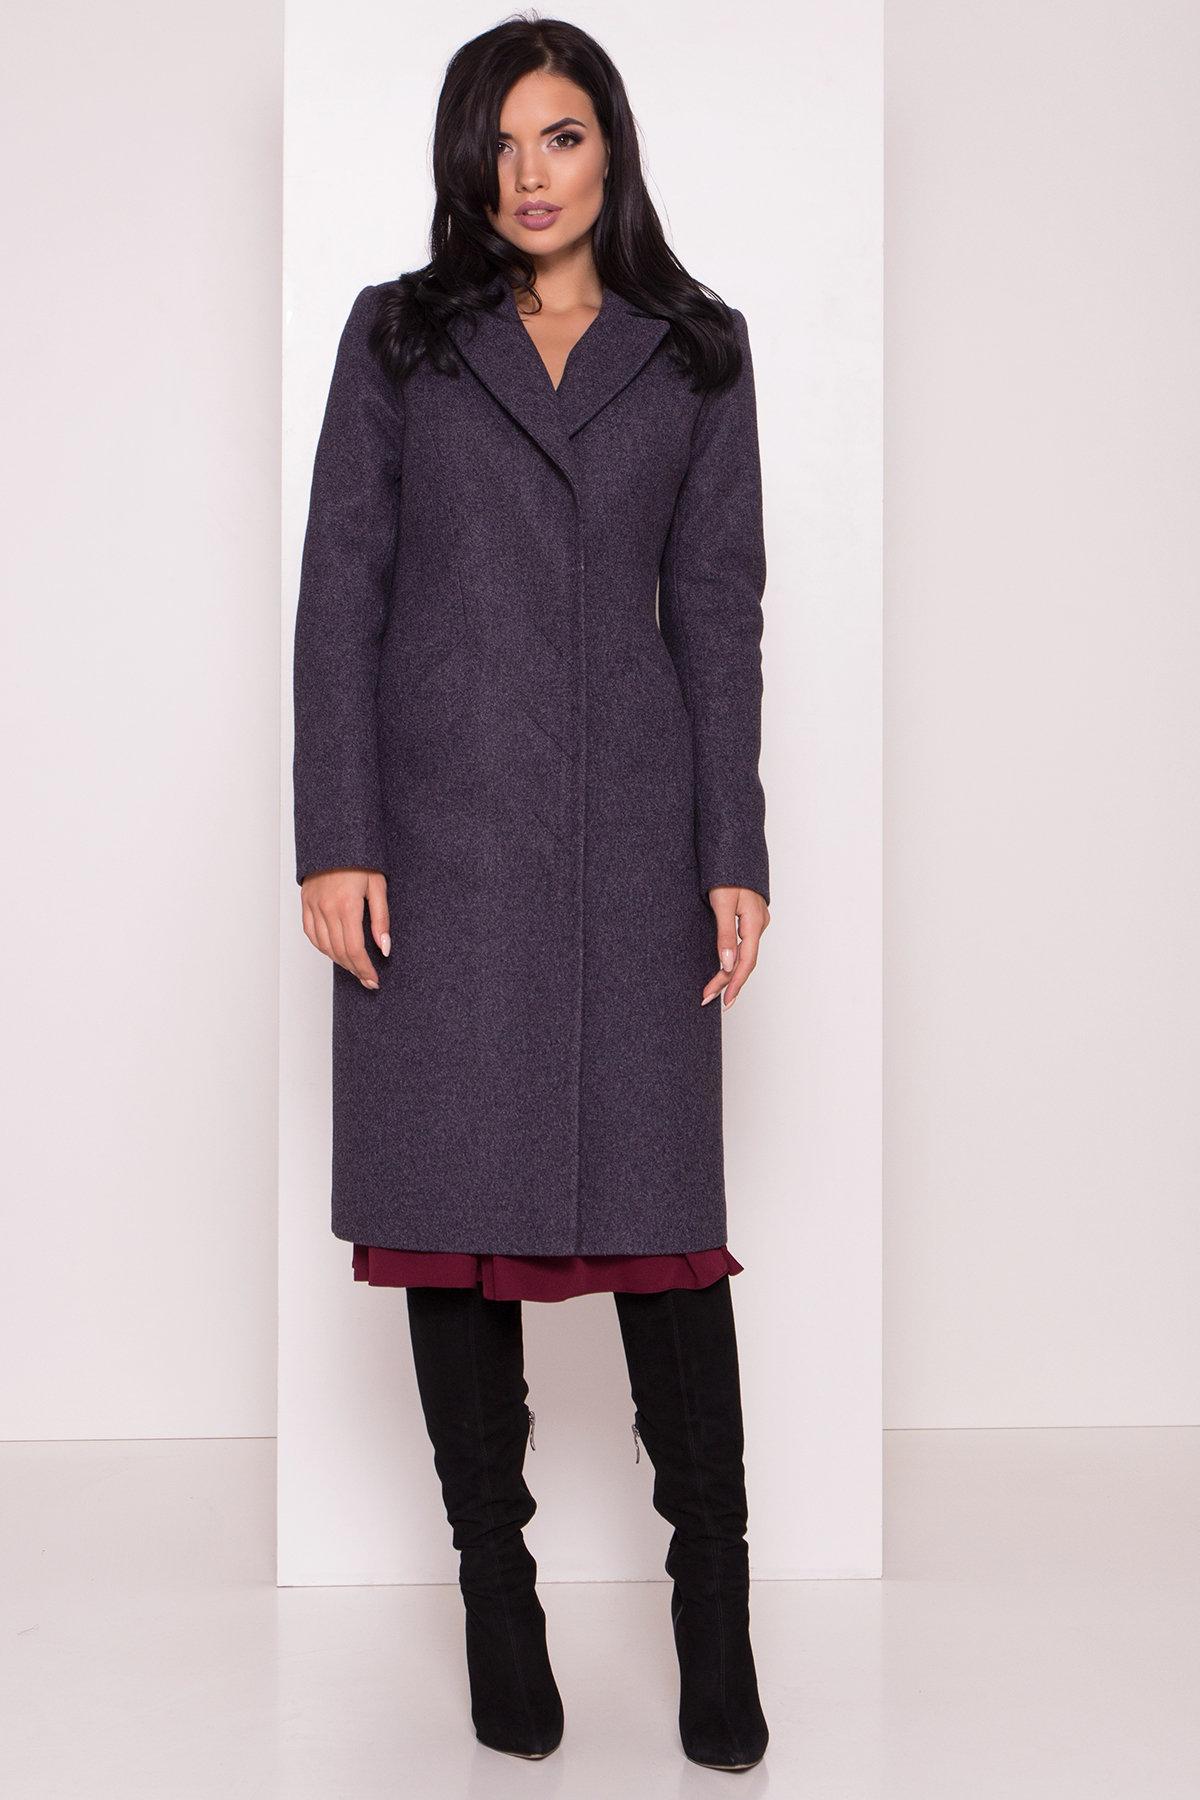 Пальто зима Кареро 8067 АРТ. 44013 Цвет: Т.синий 543 - фото 5, интернет магазин tm-modus.ru